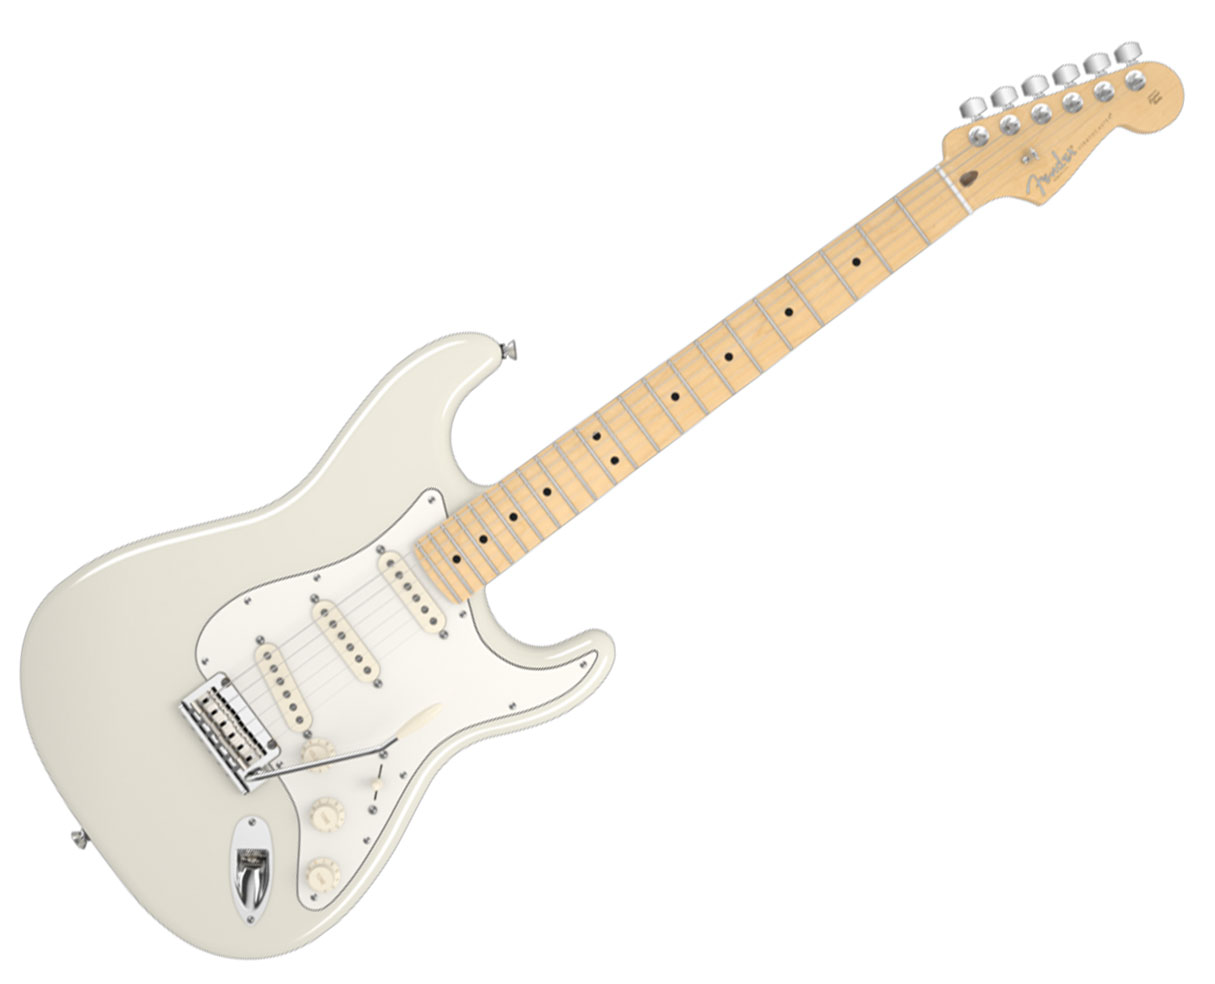 fender american standard stratocaster maple olympic white strat guitar 1g ebay. Black Bedroom Furniture Sets. Home Design Ideas